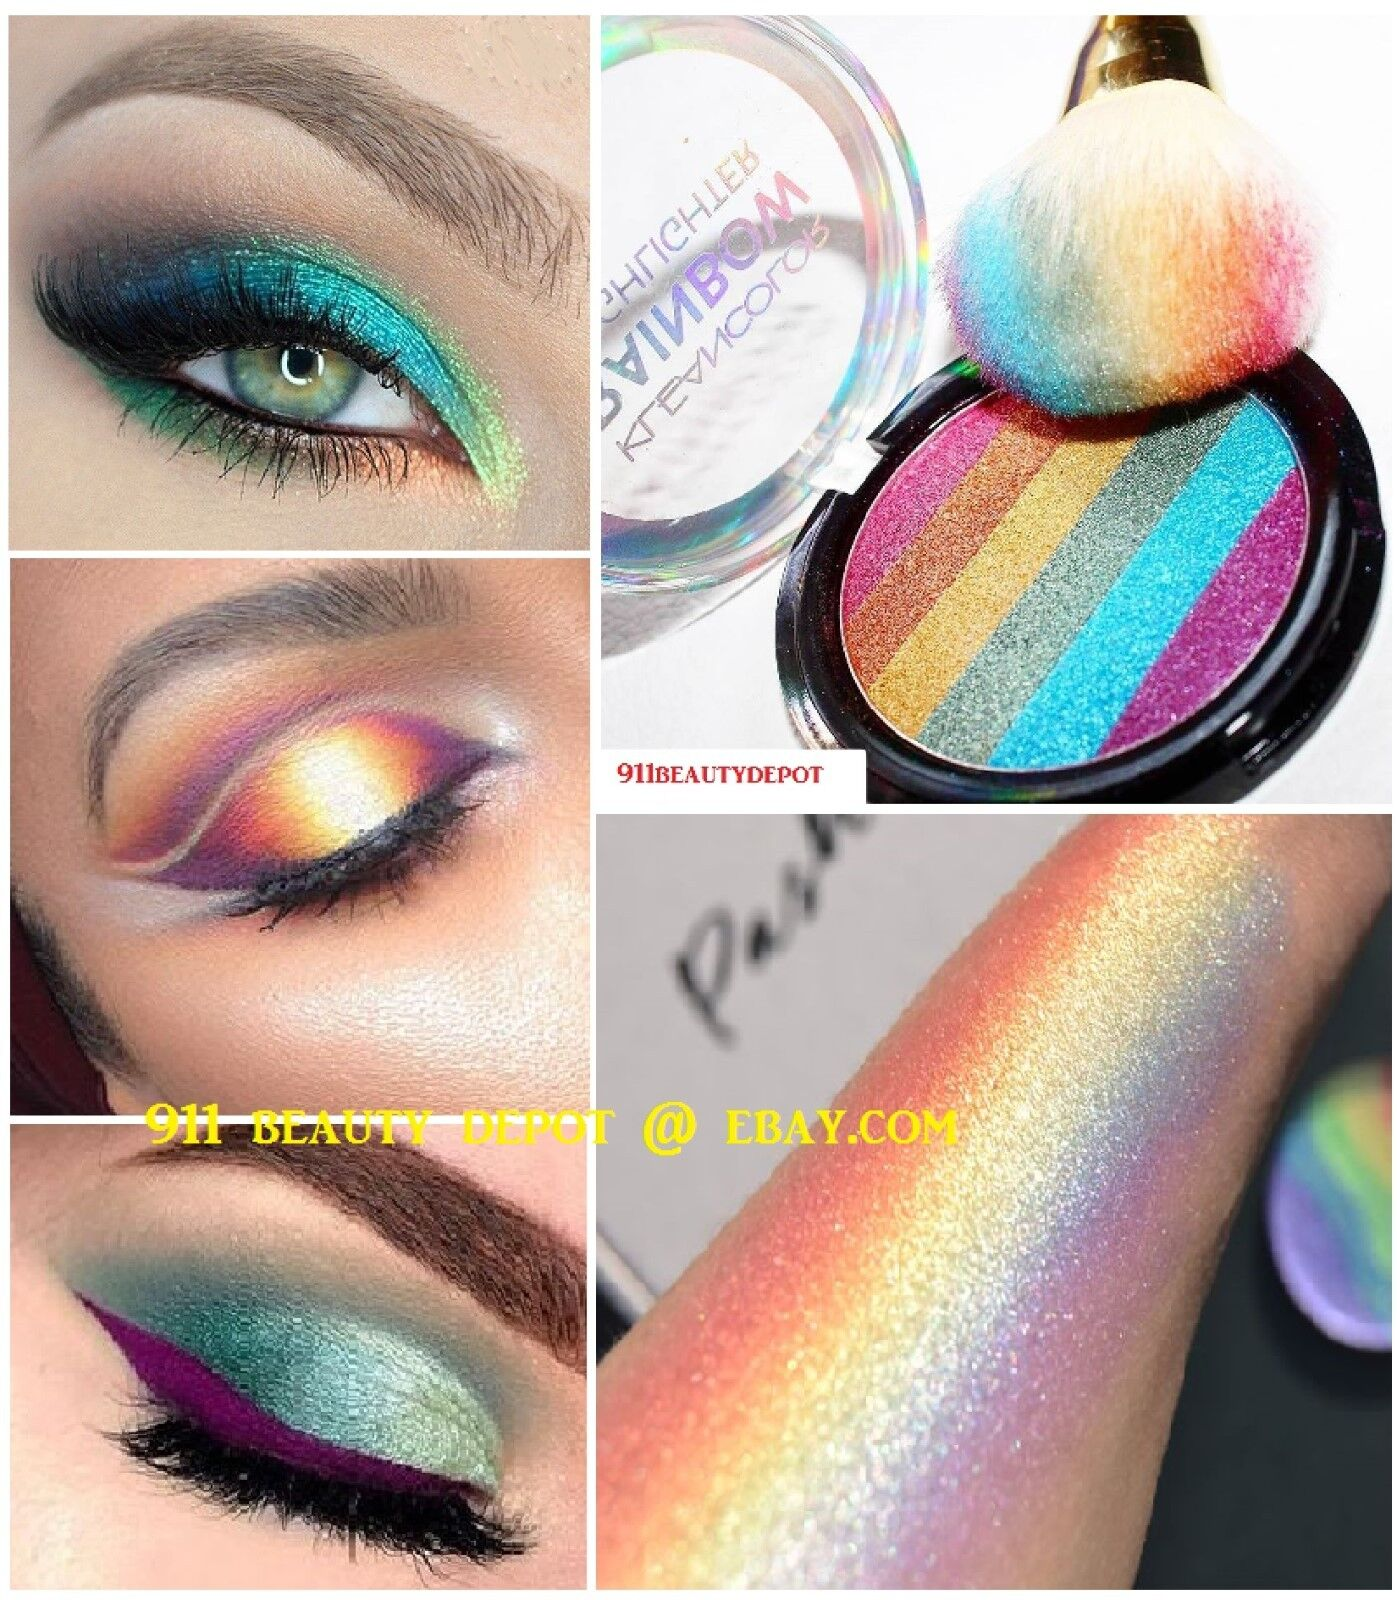 6 Colors Glitter Eyeshadow Eye Shadow Palette & Makeup Cosme